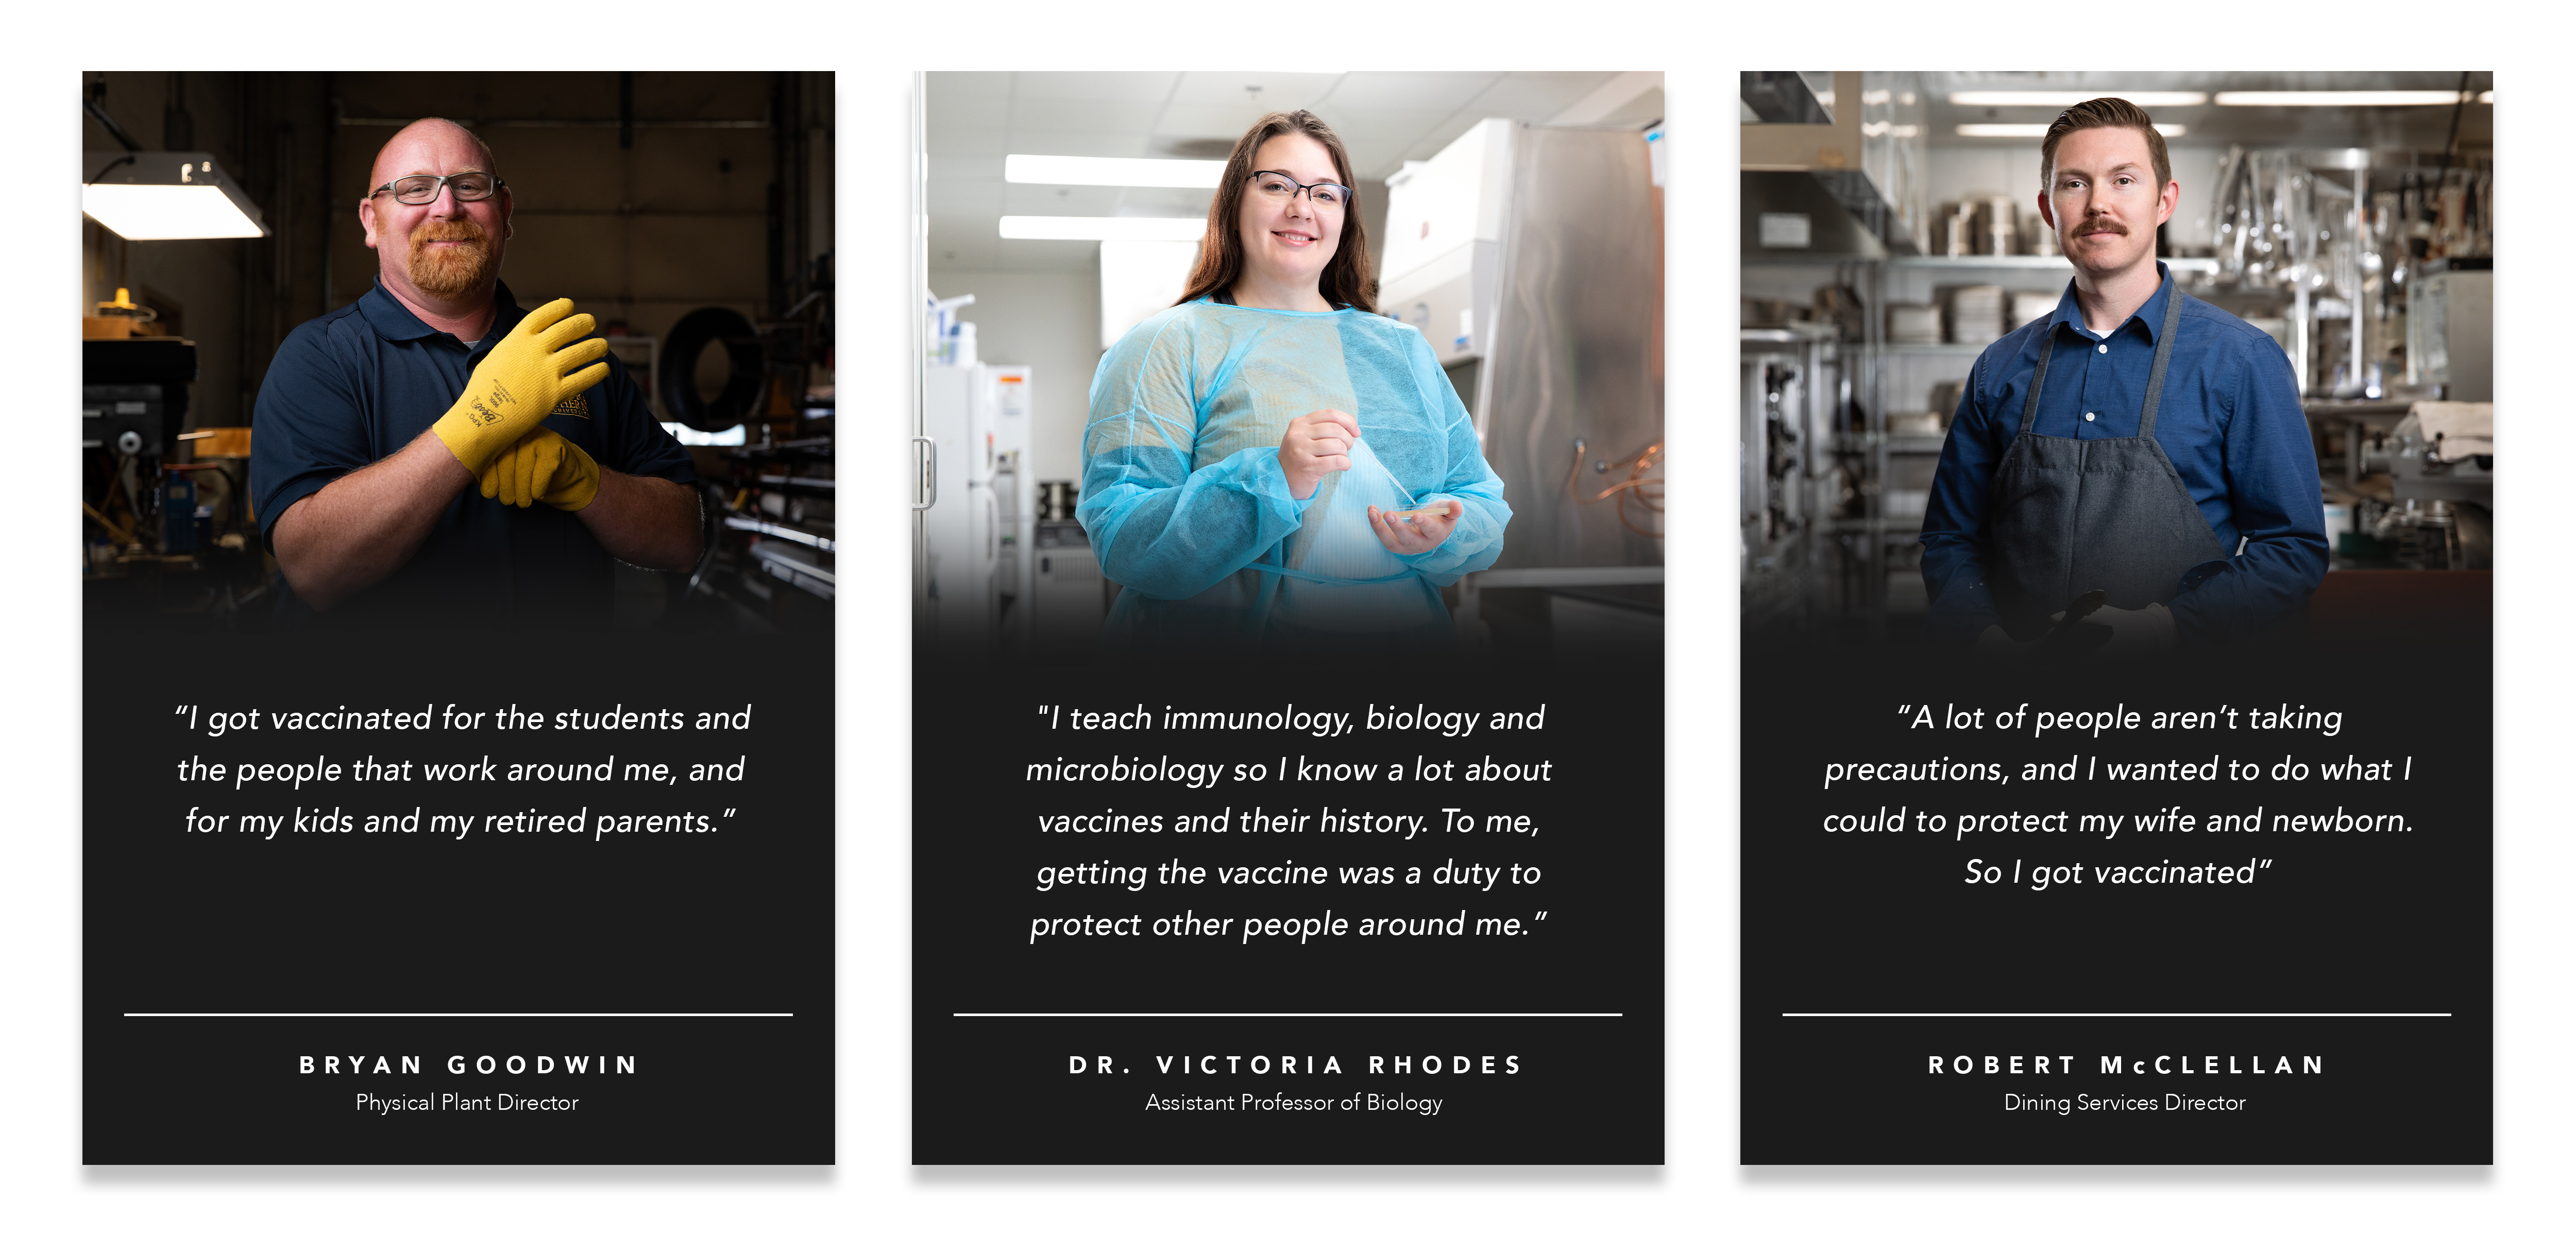 COVID Vaccine quotes